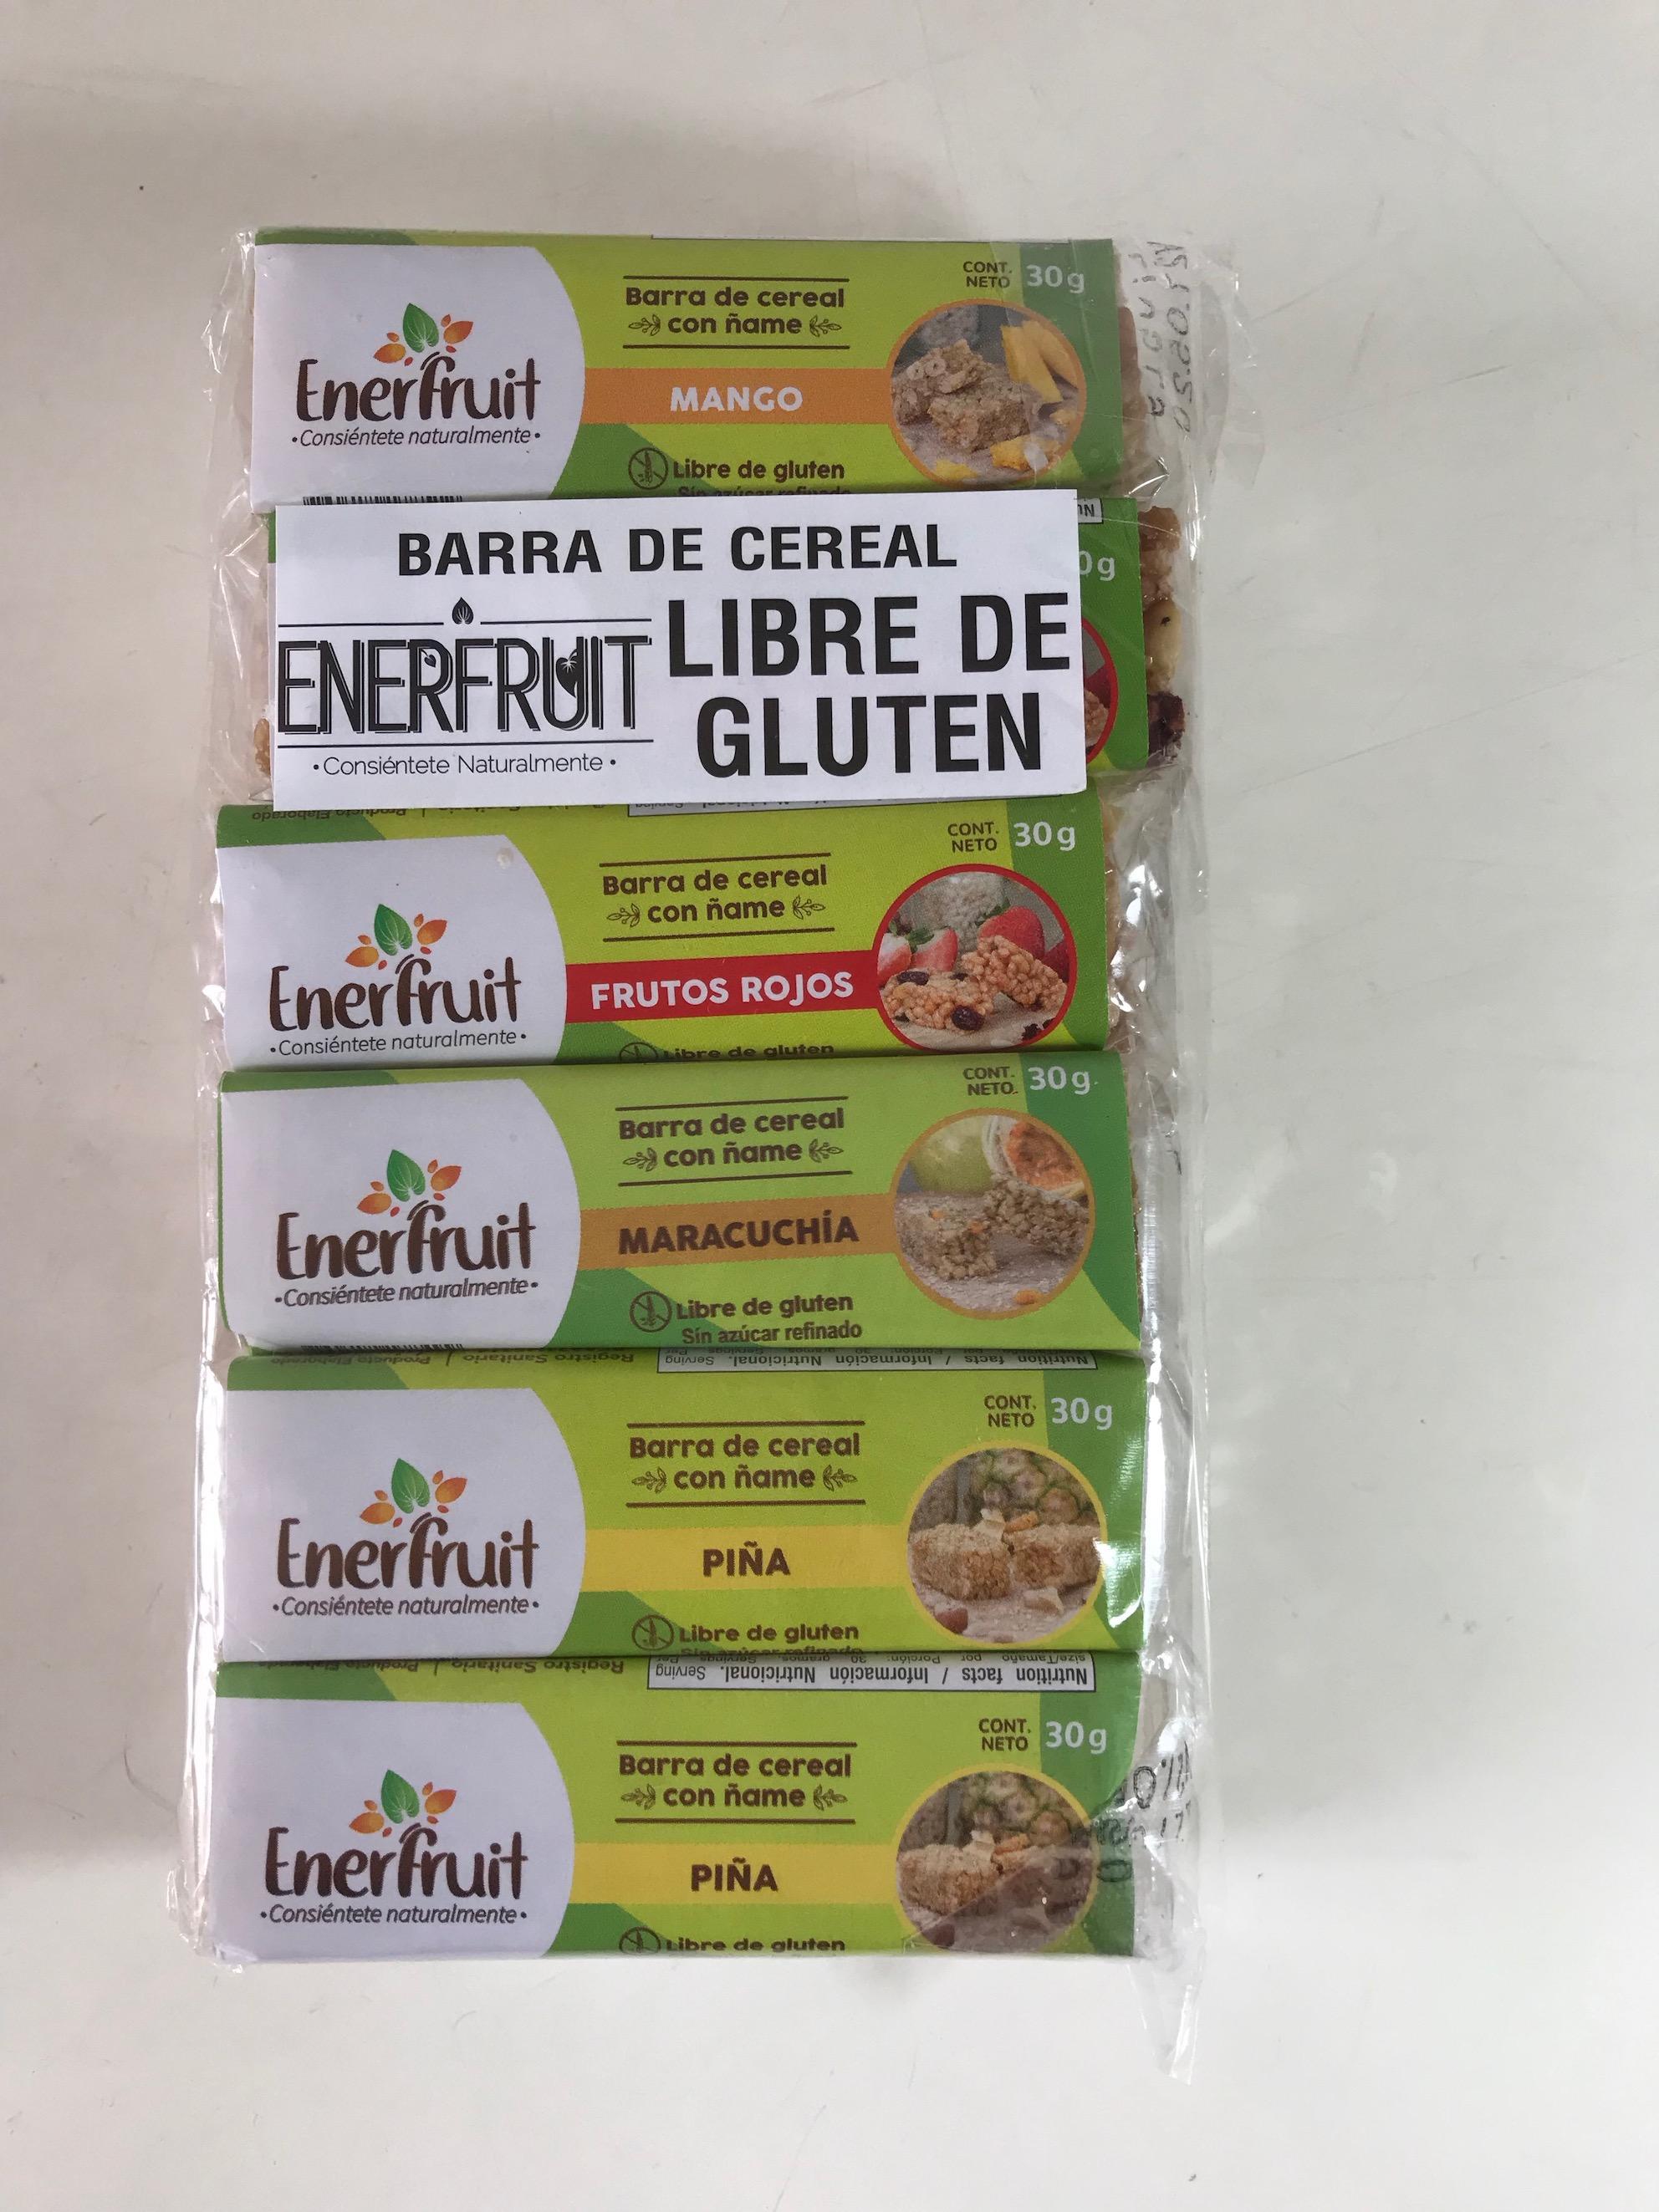 Paquete-x-12-barras-de-cereal-Enerfrut.jpeg